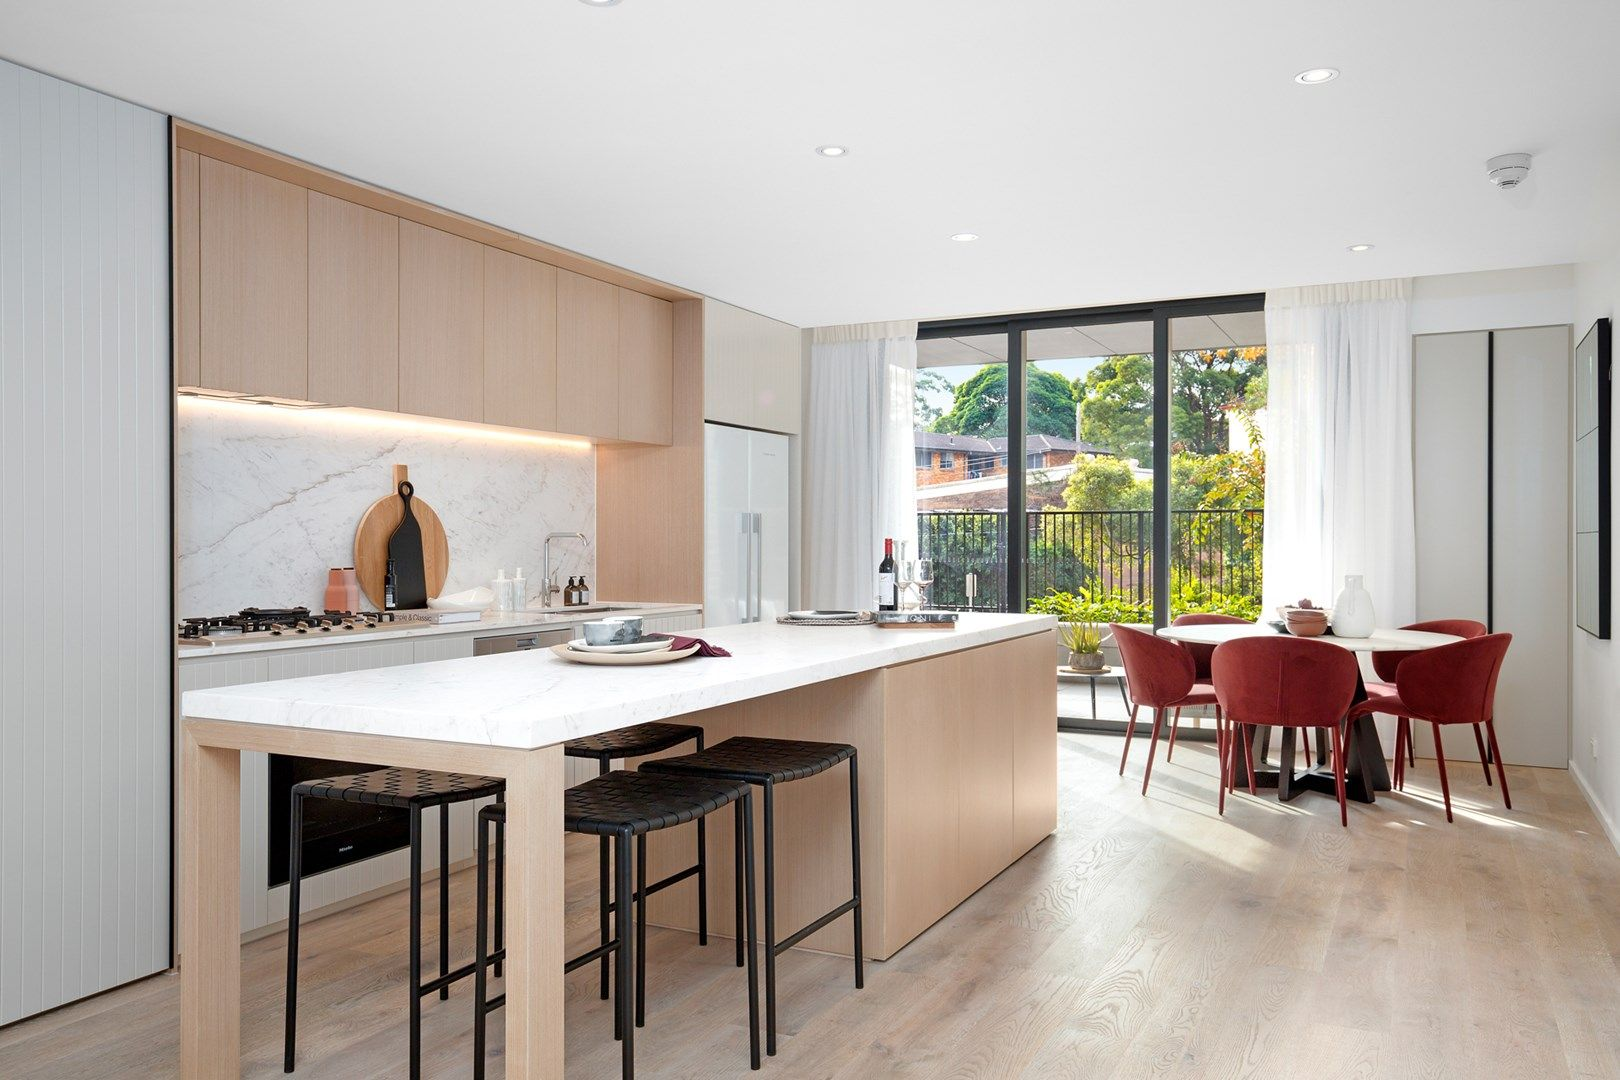 2-22 Birdwood Avenue, Lane Cove, NSW 2066, Image 0